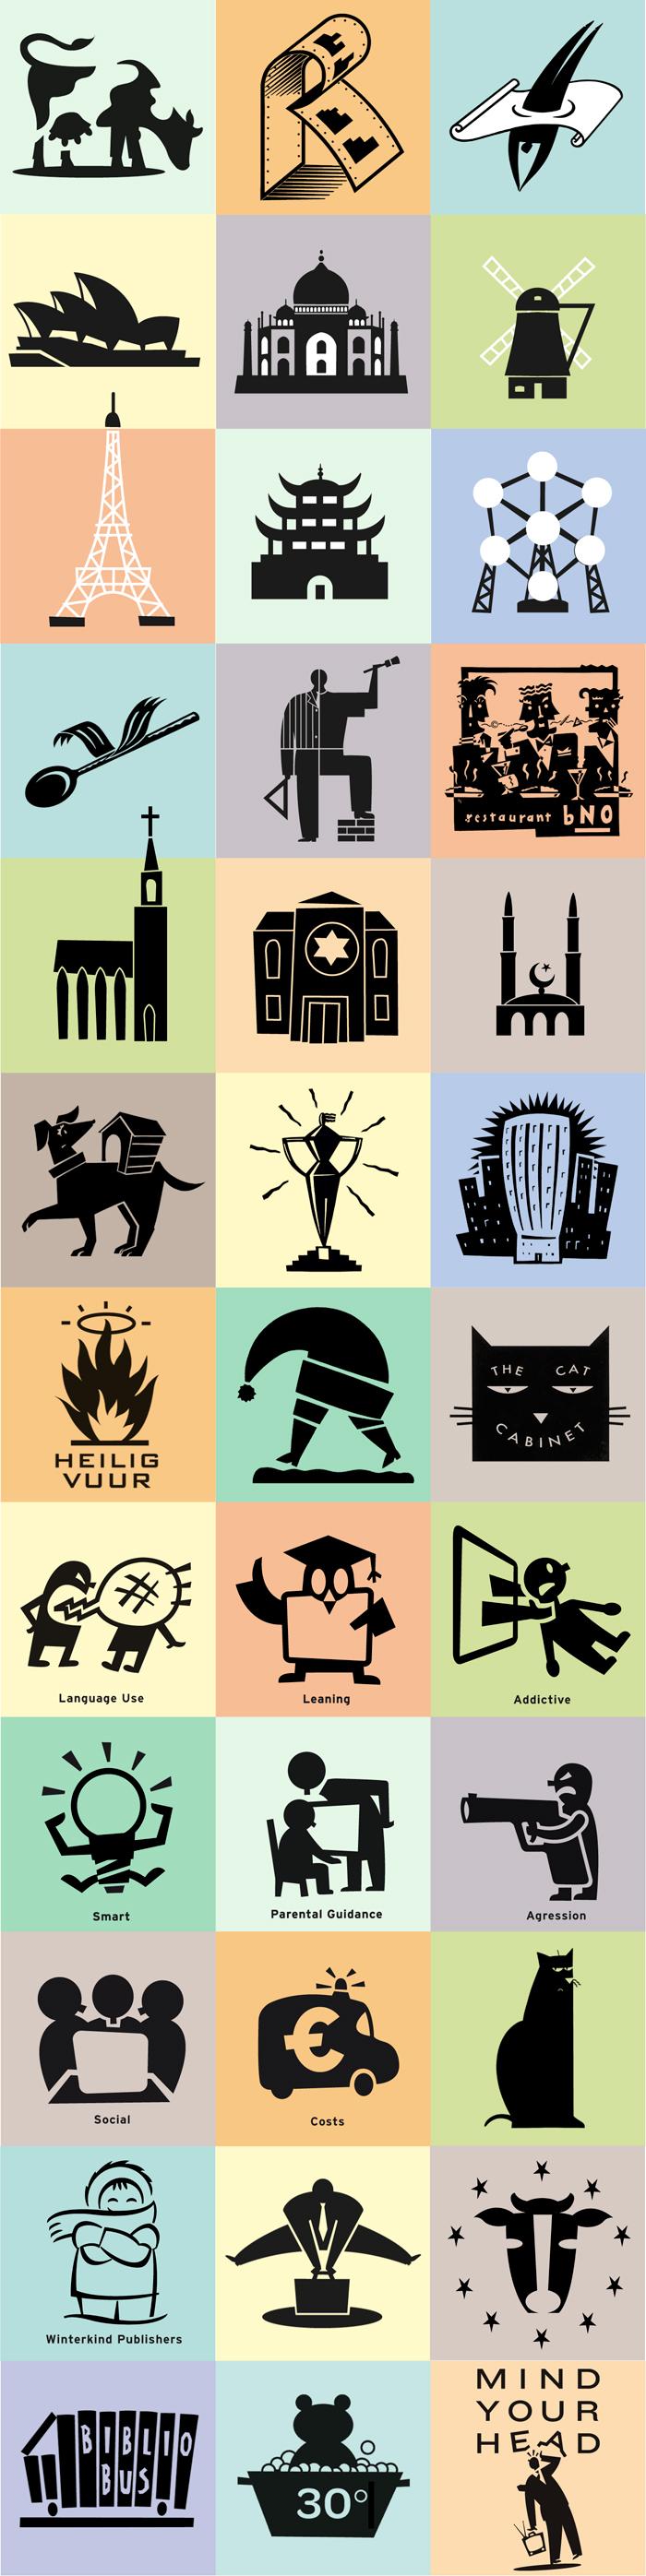 various illustrative pictograms, illustratieve pictogrammen